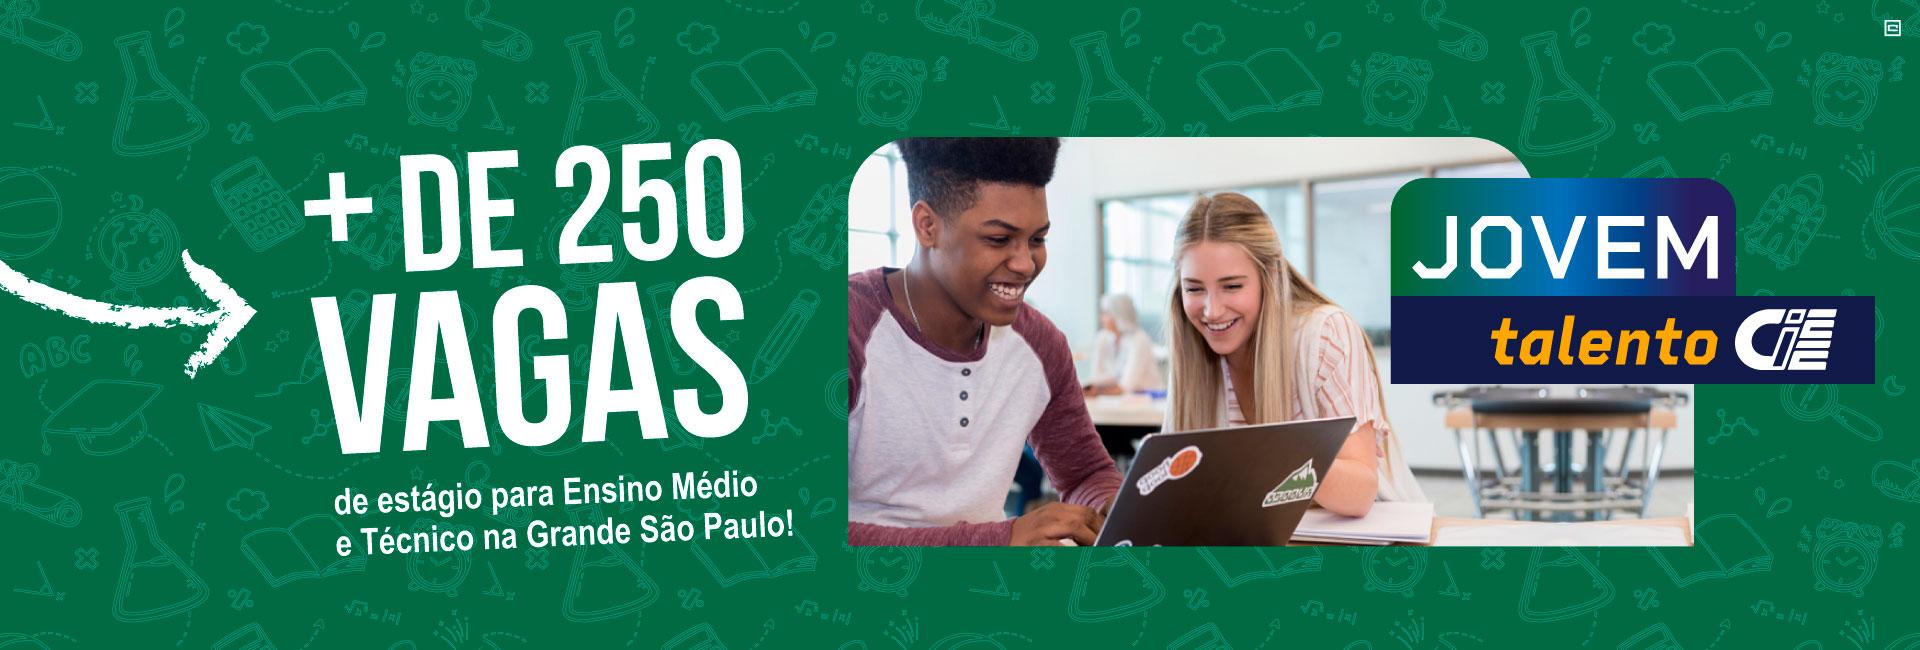 Jovem Talento CIEE + de 250 vagas de estágio para Ensino Médio na Grande São Paulo!